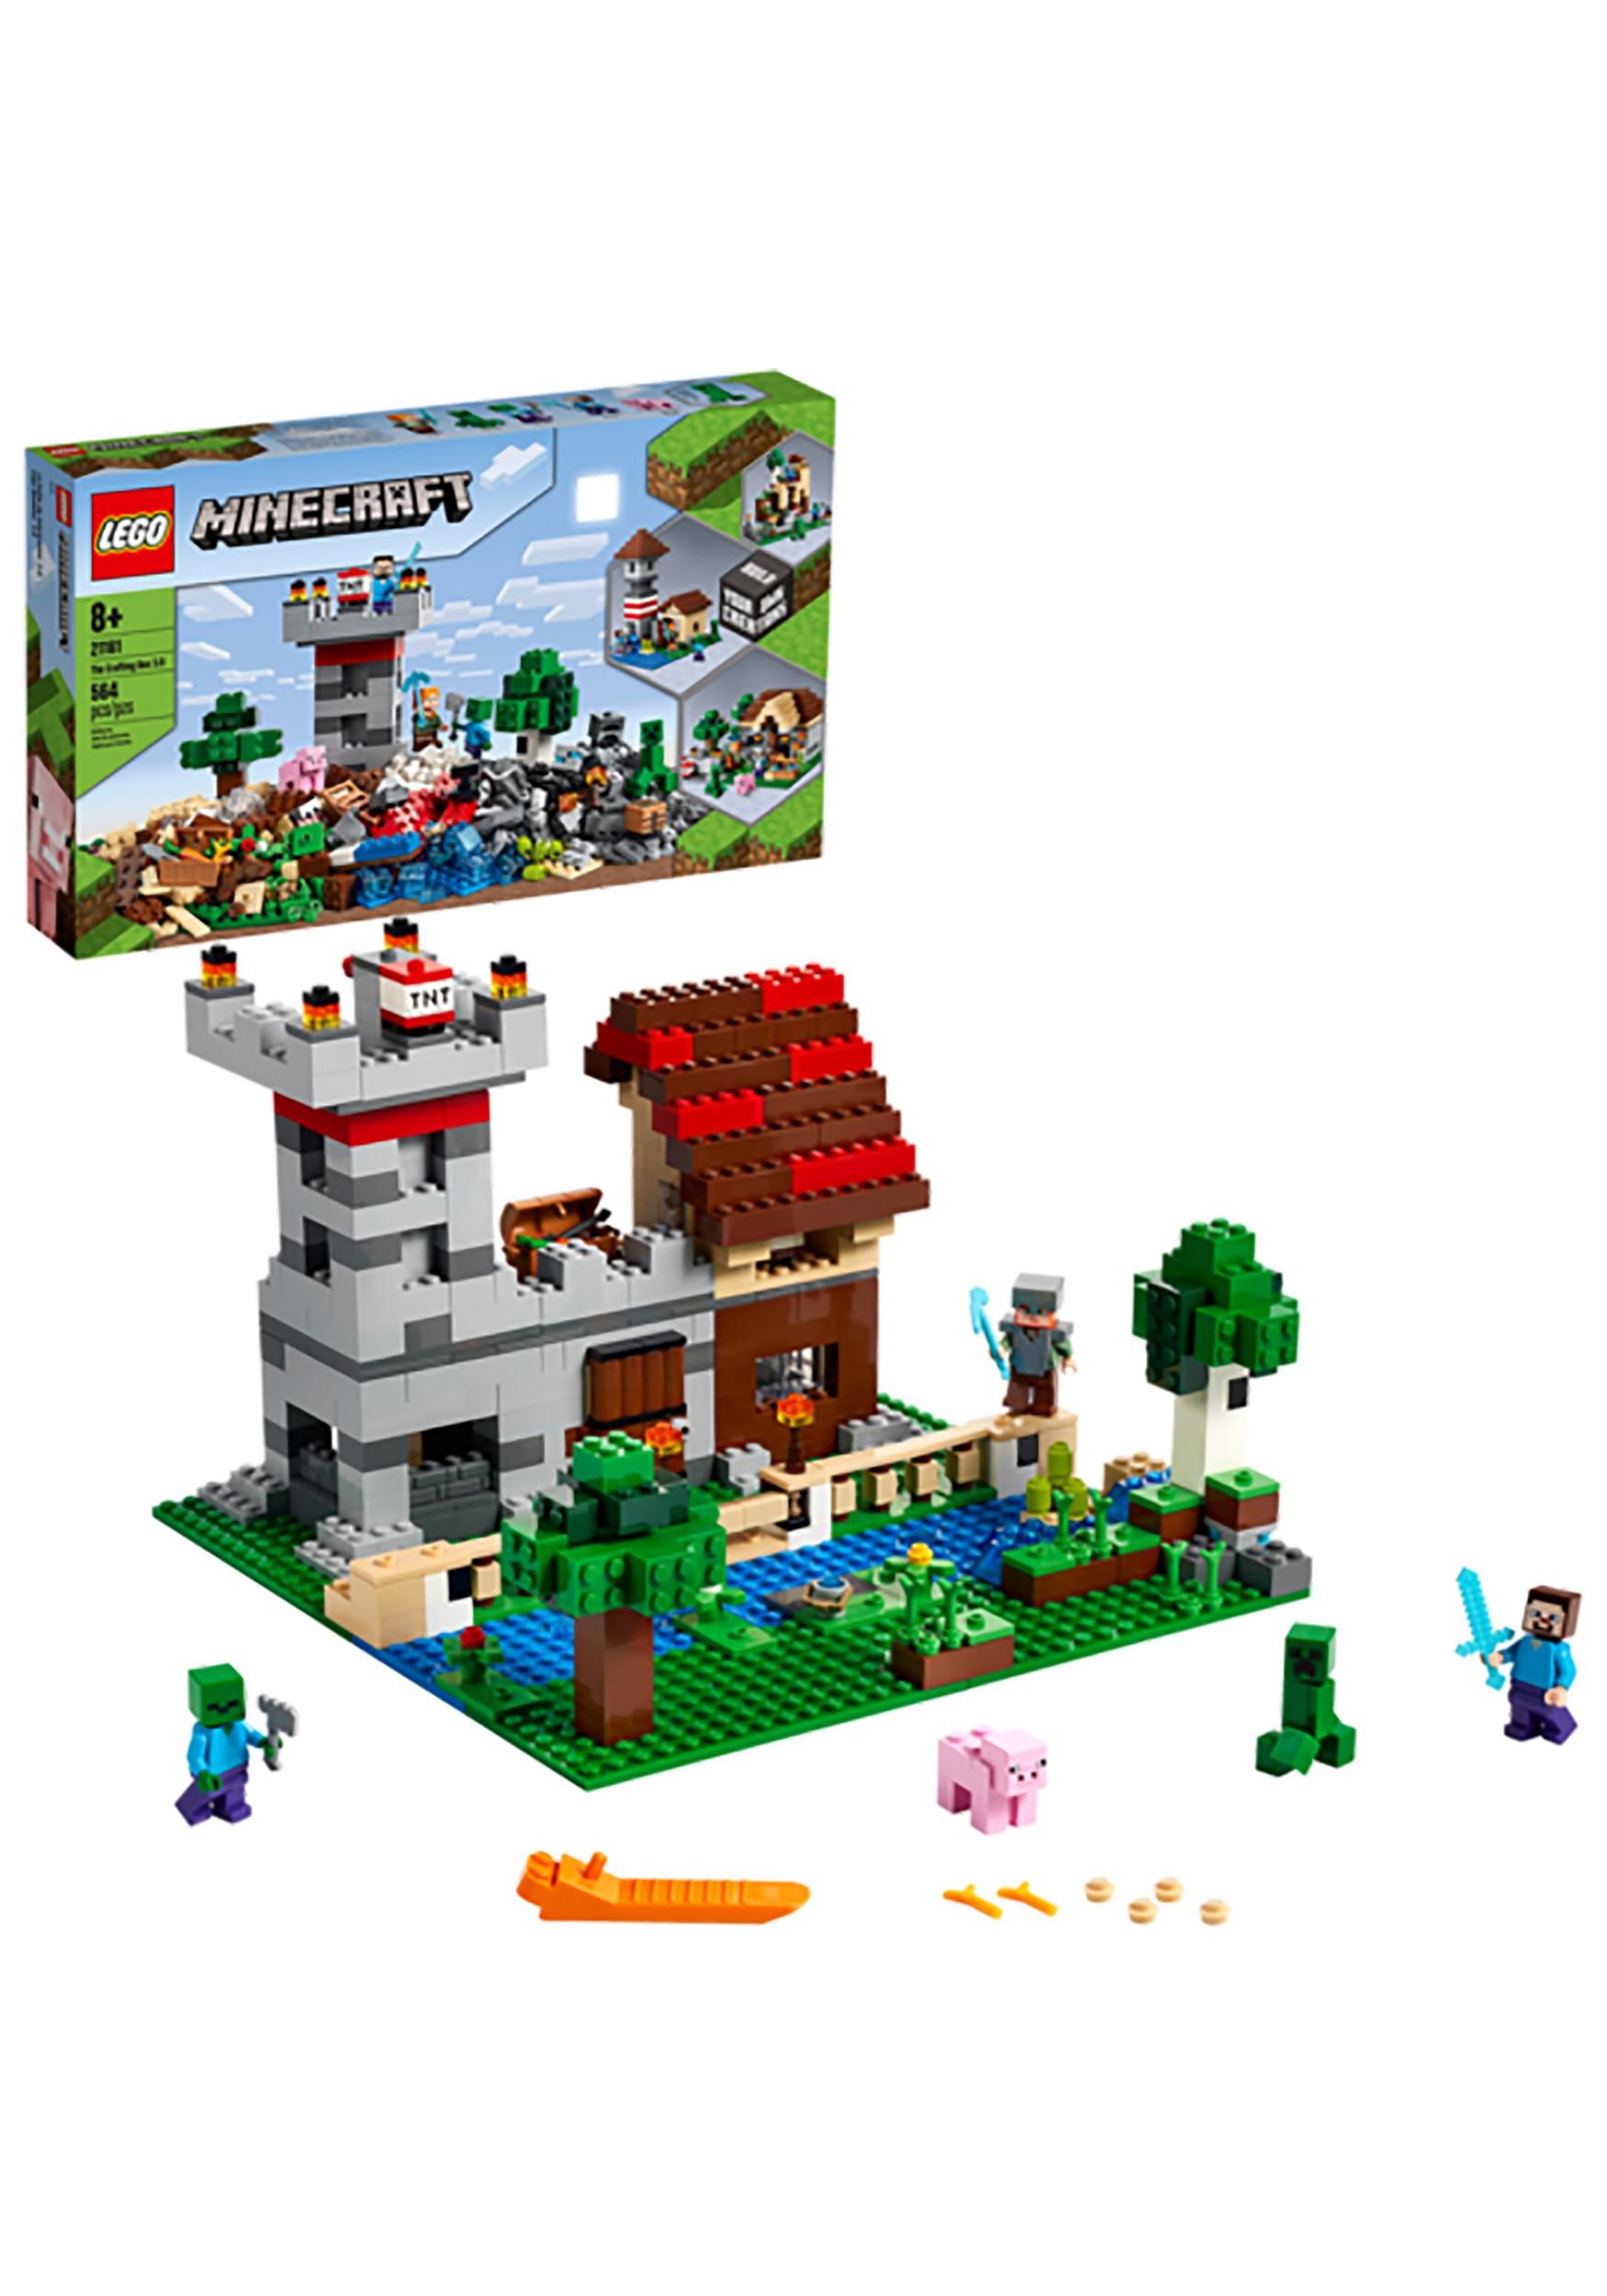 LEGO Minecraft Crafting Box 3.0 Playset